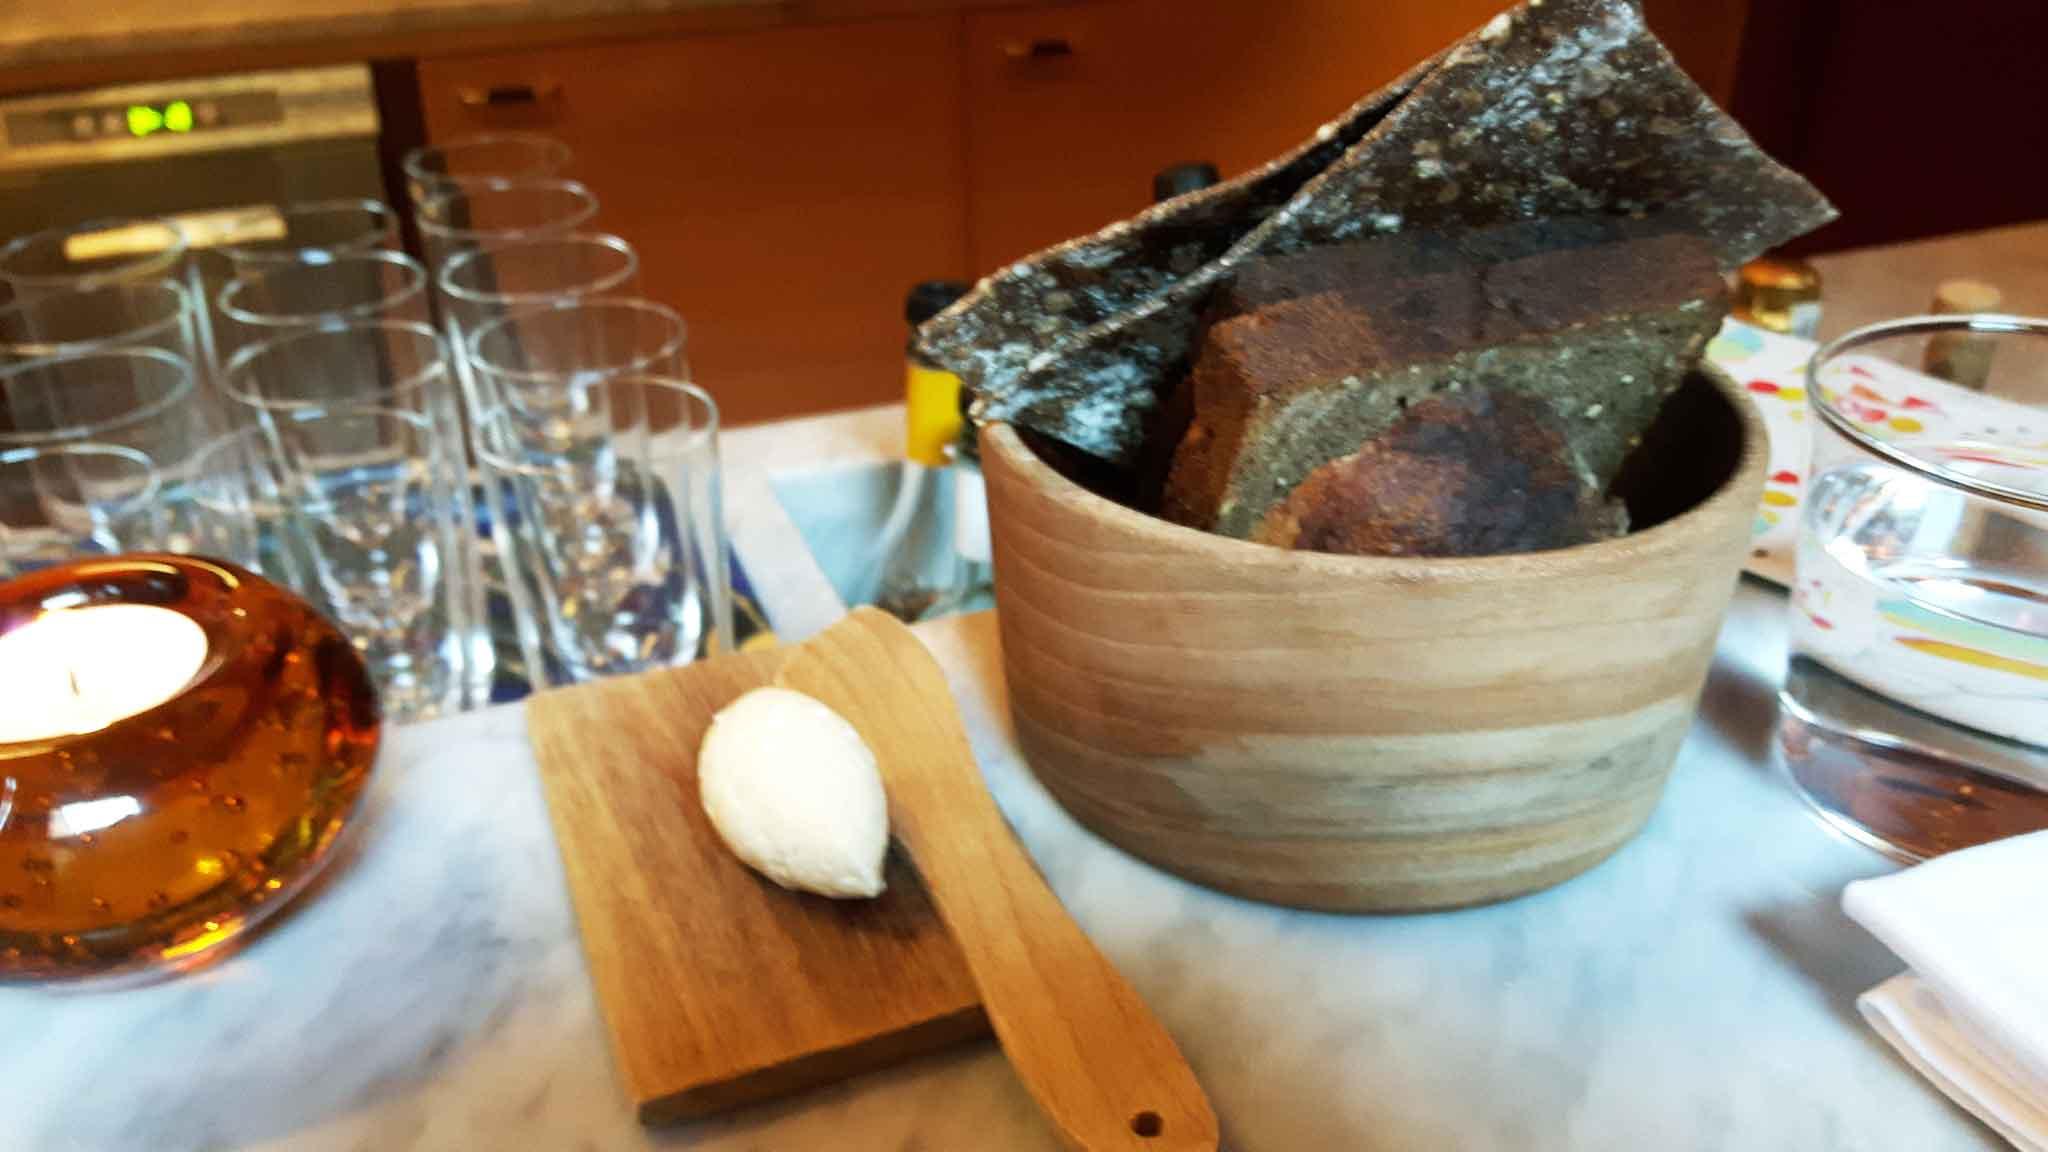 bjork milano pane e burro